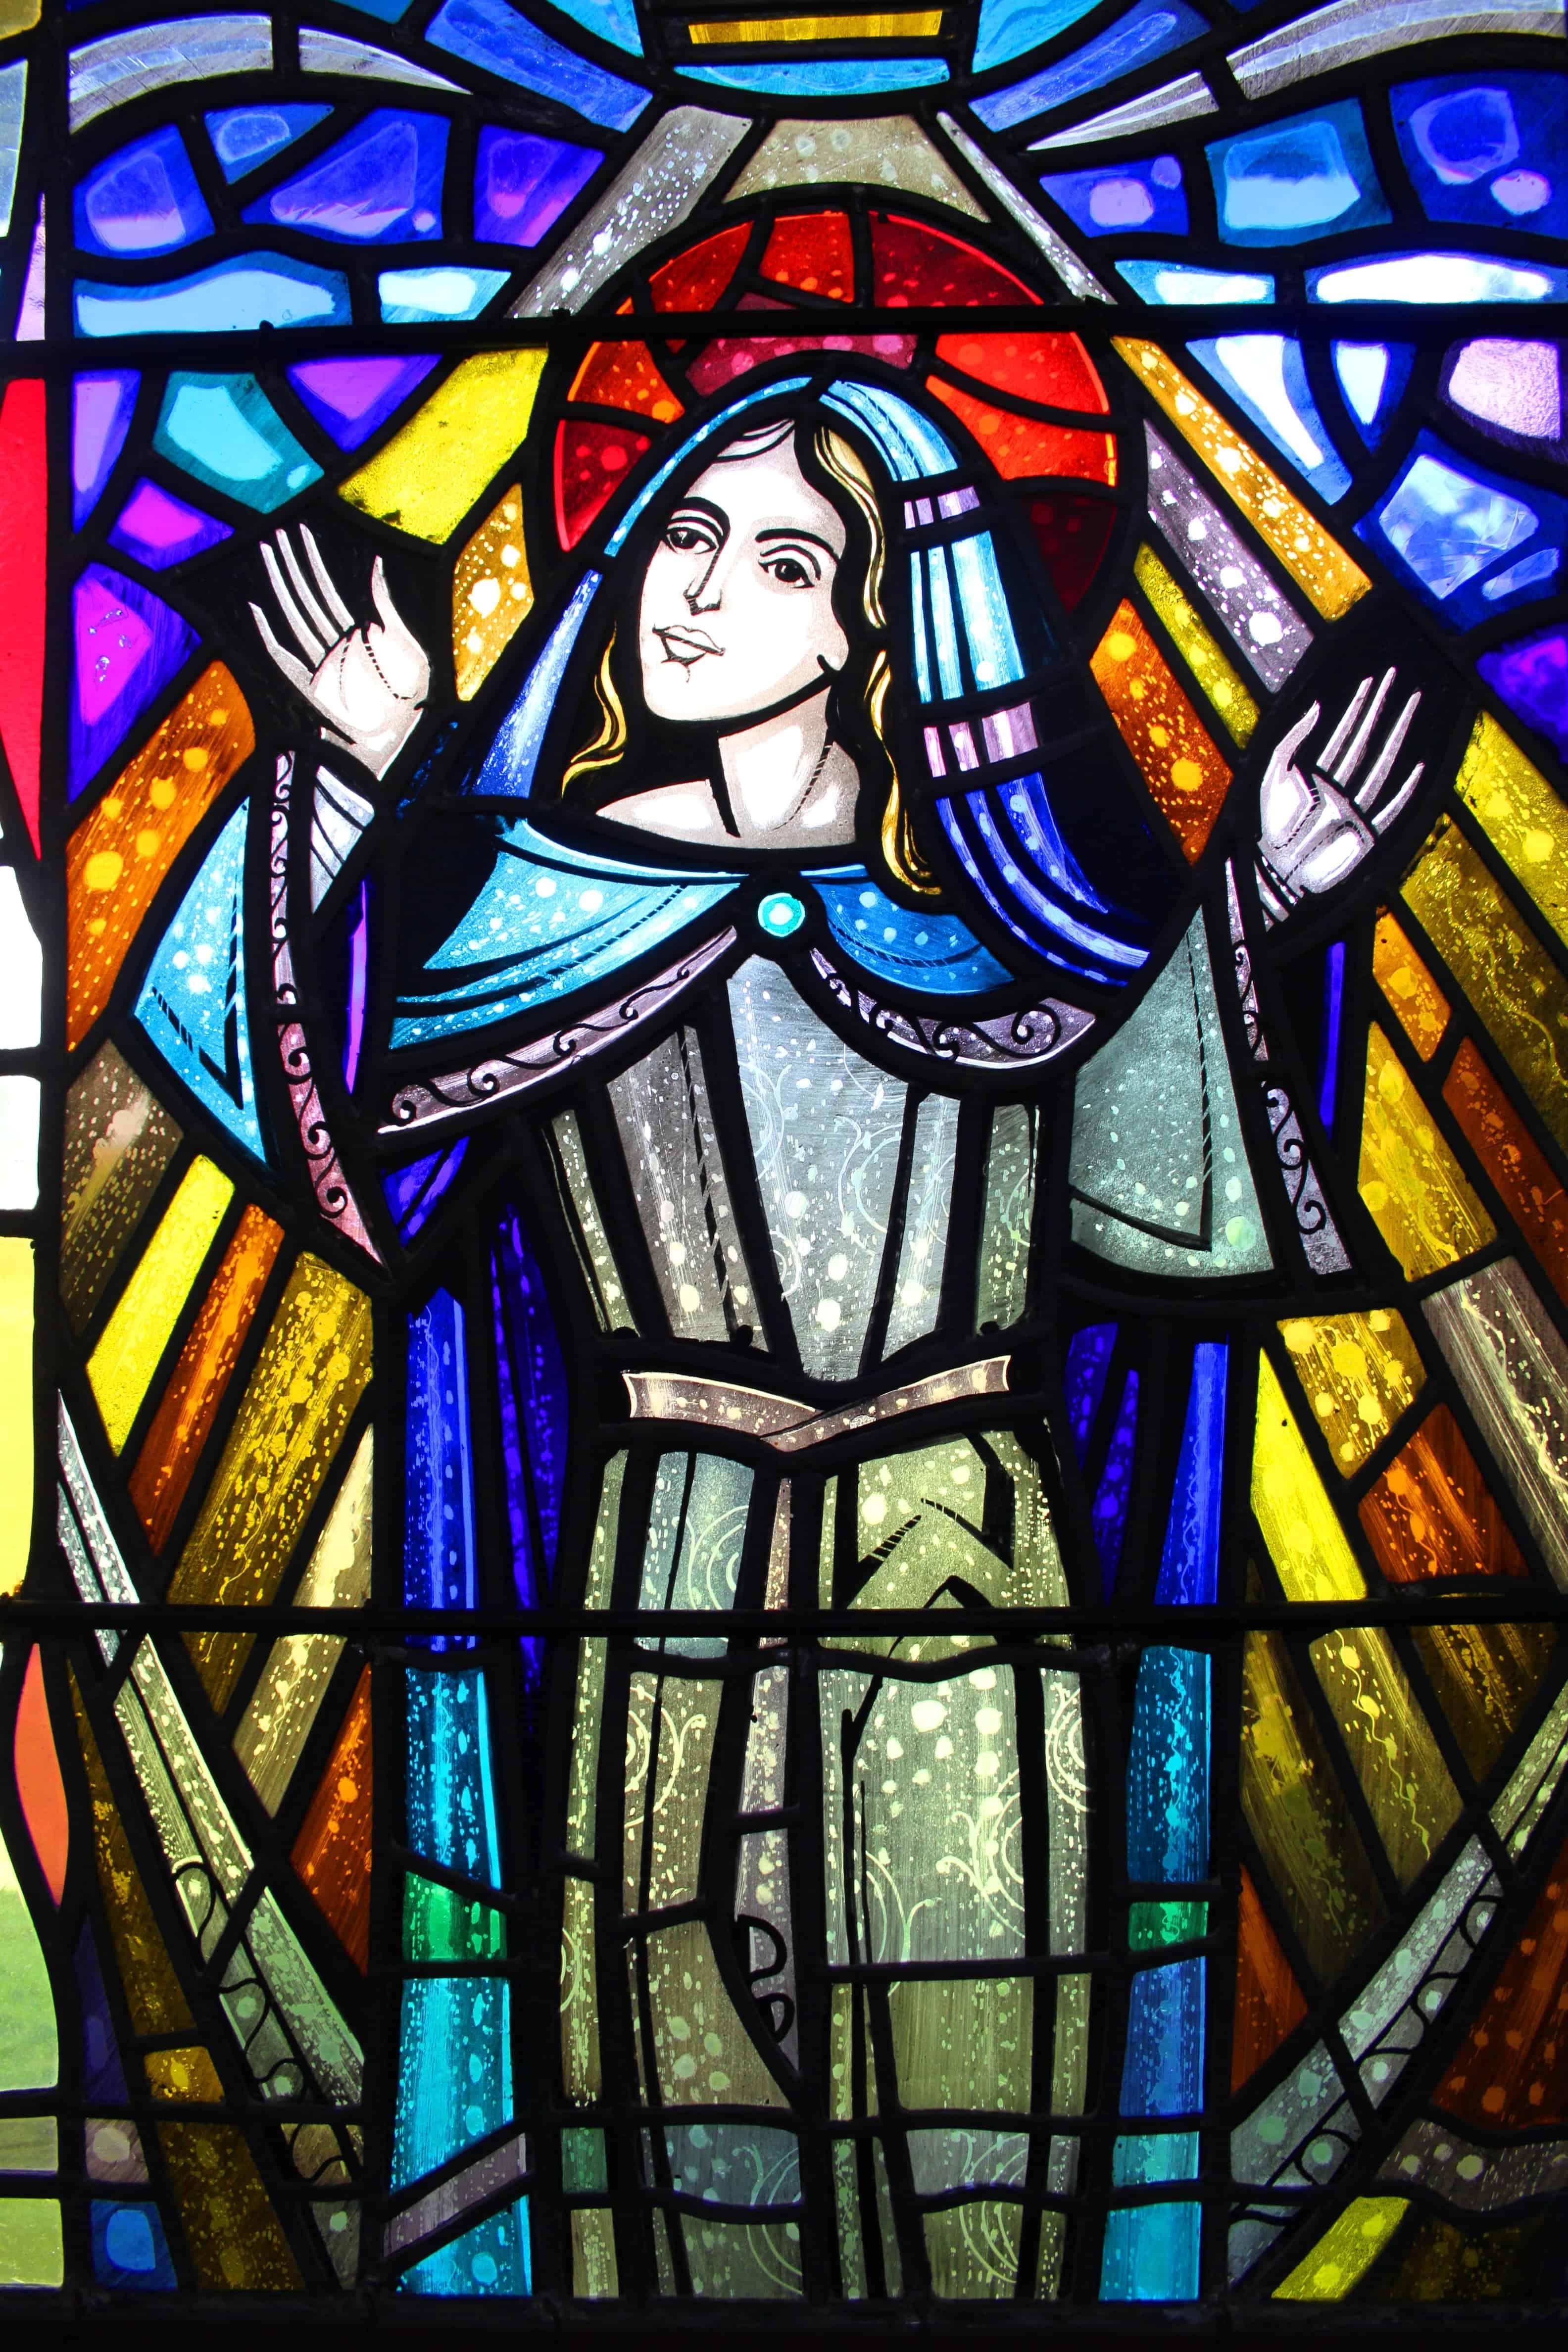 St Maurs Parish, Rush stained glass image Web Design